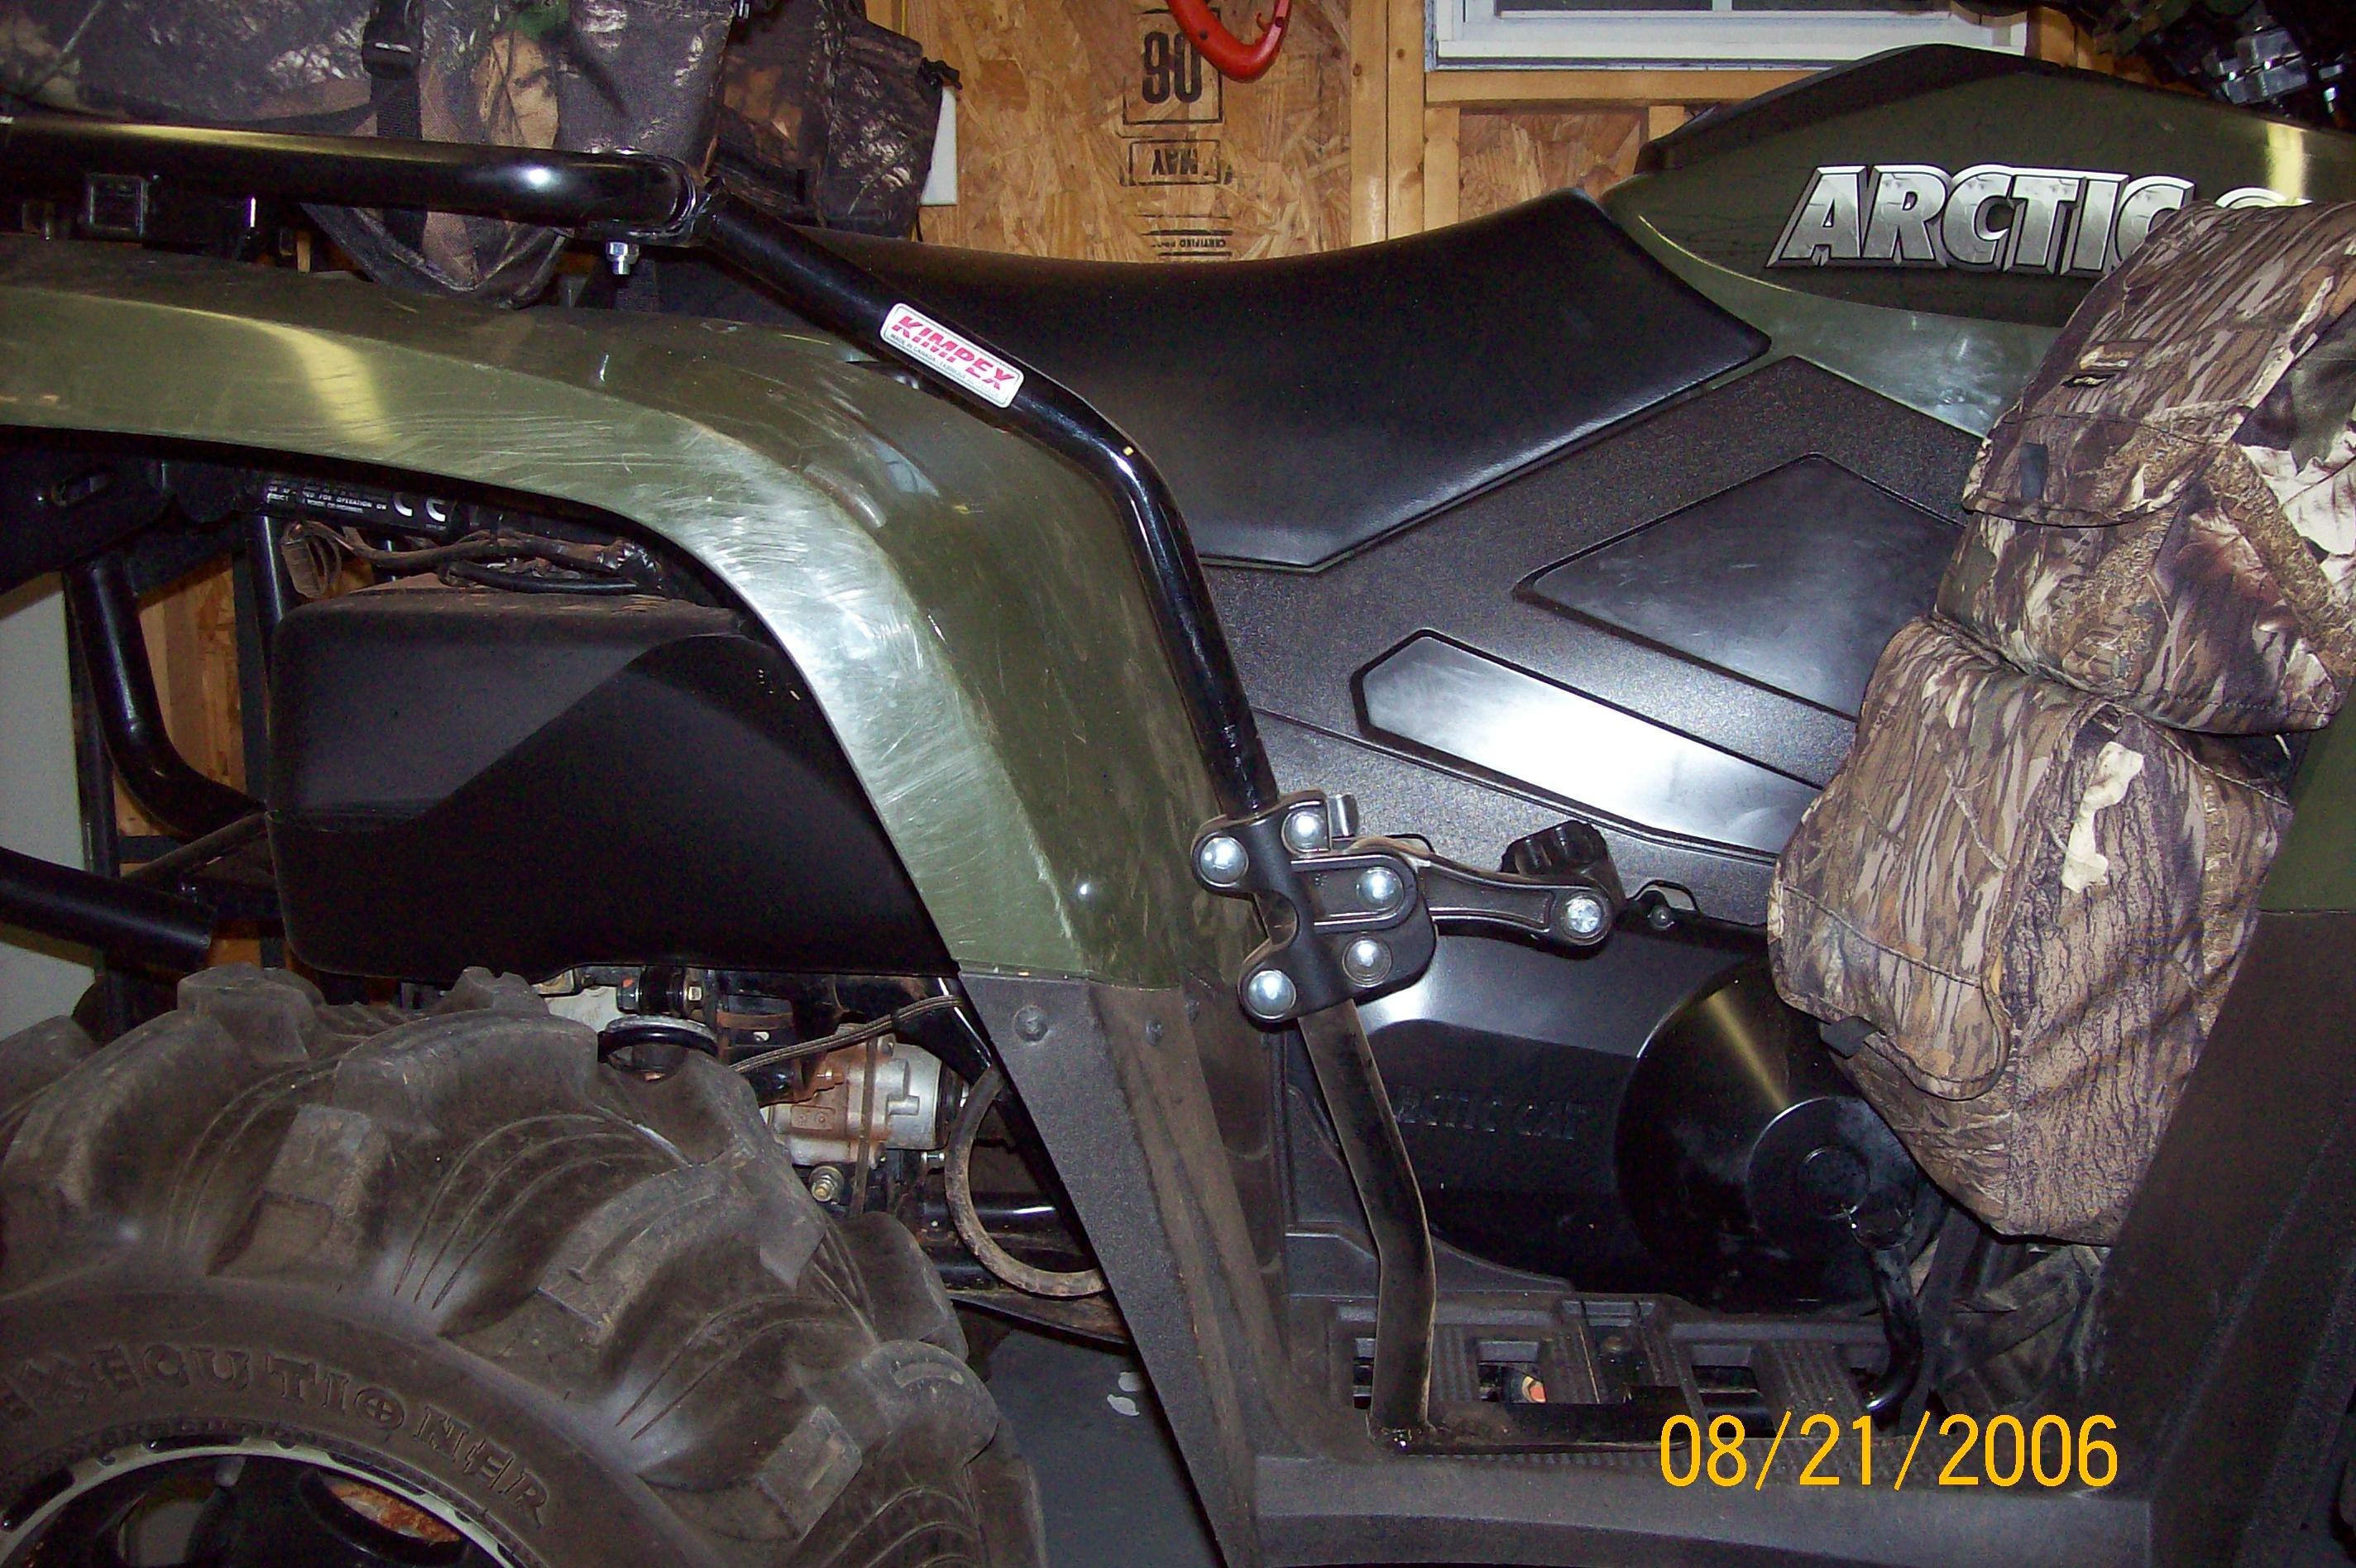 194882d1286148215 kimpex passenger pegs 077 kimpex passenger pegs arcticchat com arctic cat forum kimpex wiring diagram at readyjetset.co